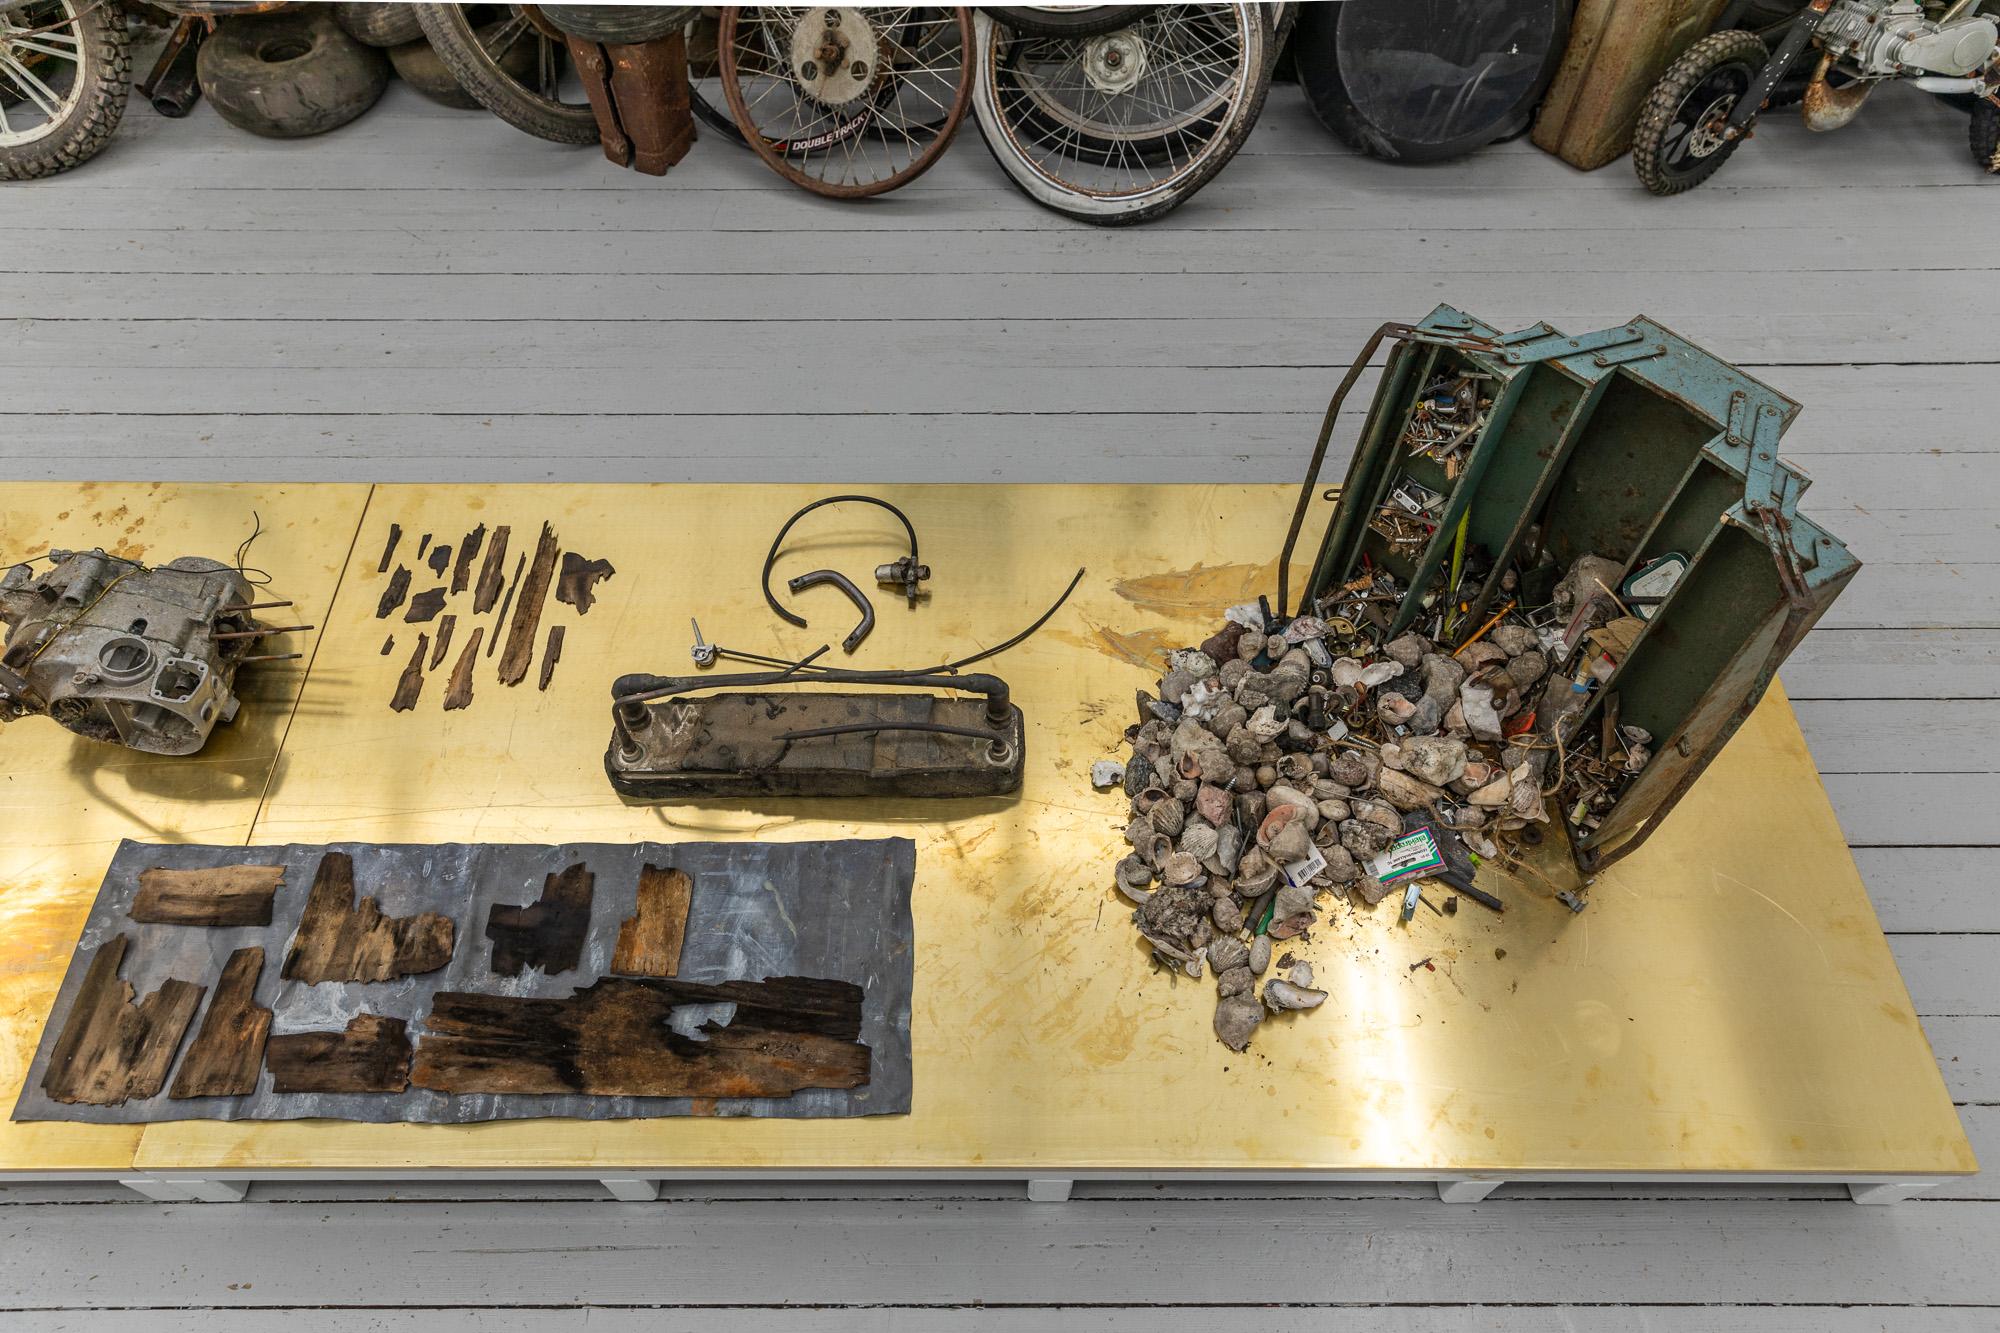 Catwalk Palett, 2020, Mixed media (textile, clay, powder-coated steel, brass, plywood, shells) on artist designed pedestal, 67 x 100 x 400 cm. Detail